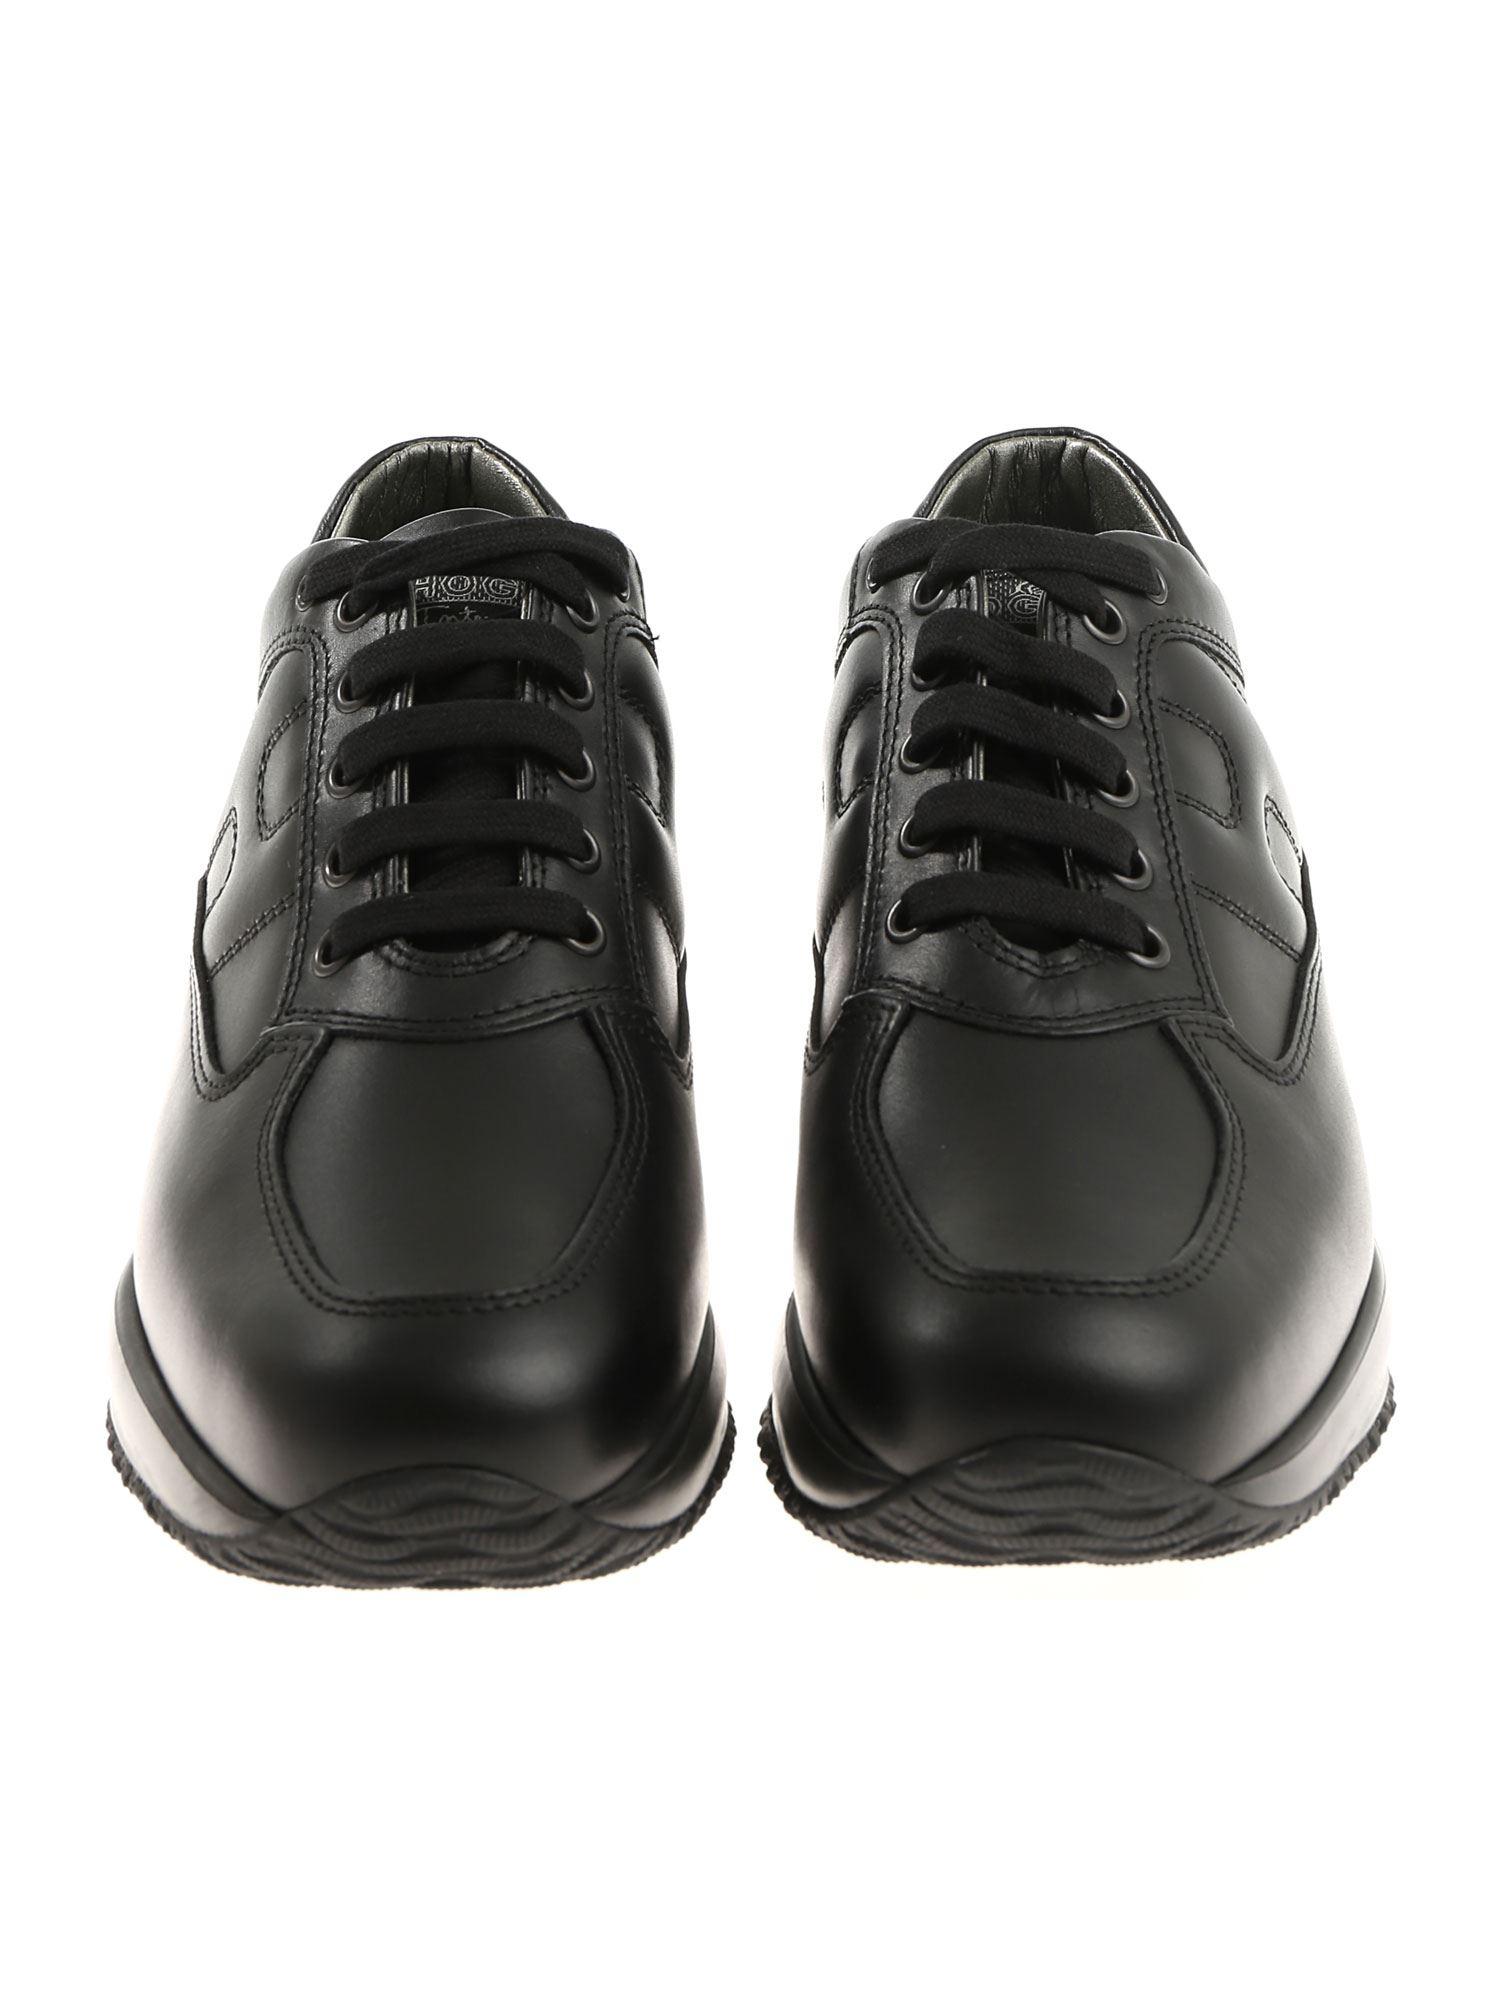 Sneaker allacciate Interactive HXW00N00010HQKB999 HOGAN   5032294   HXW00N00010HQKB999